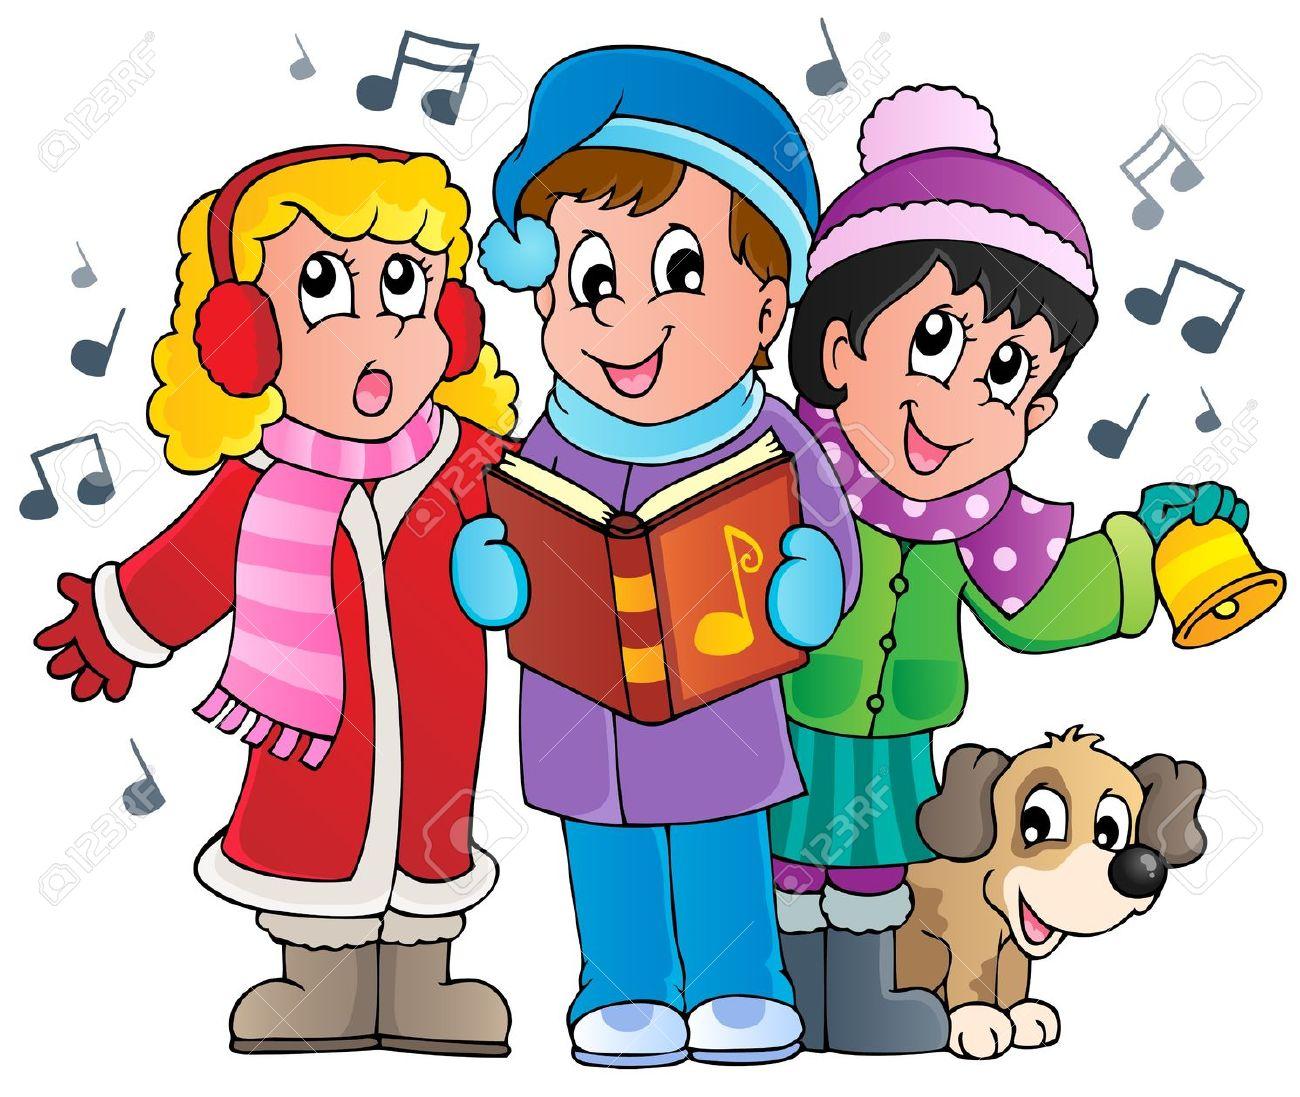 Christmas carol singers theme .-Christmas carol singers theme .-4